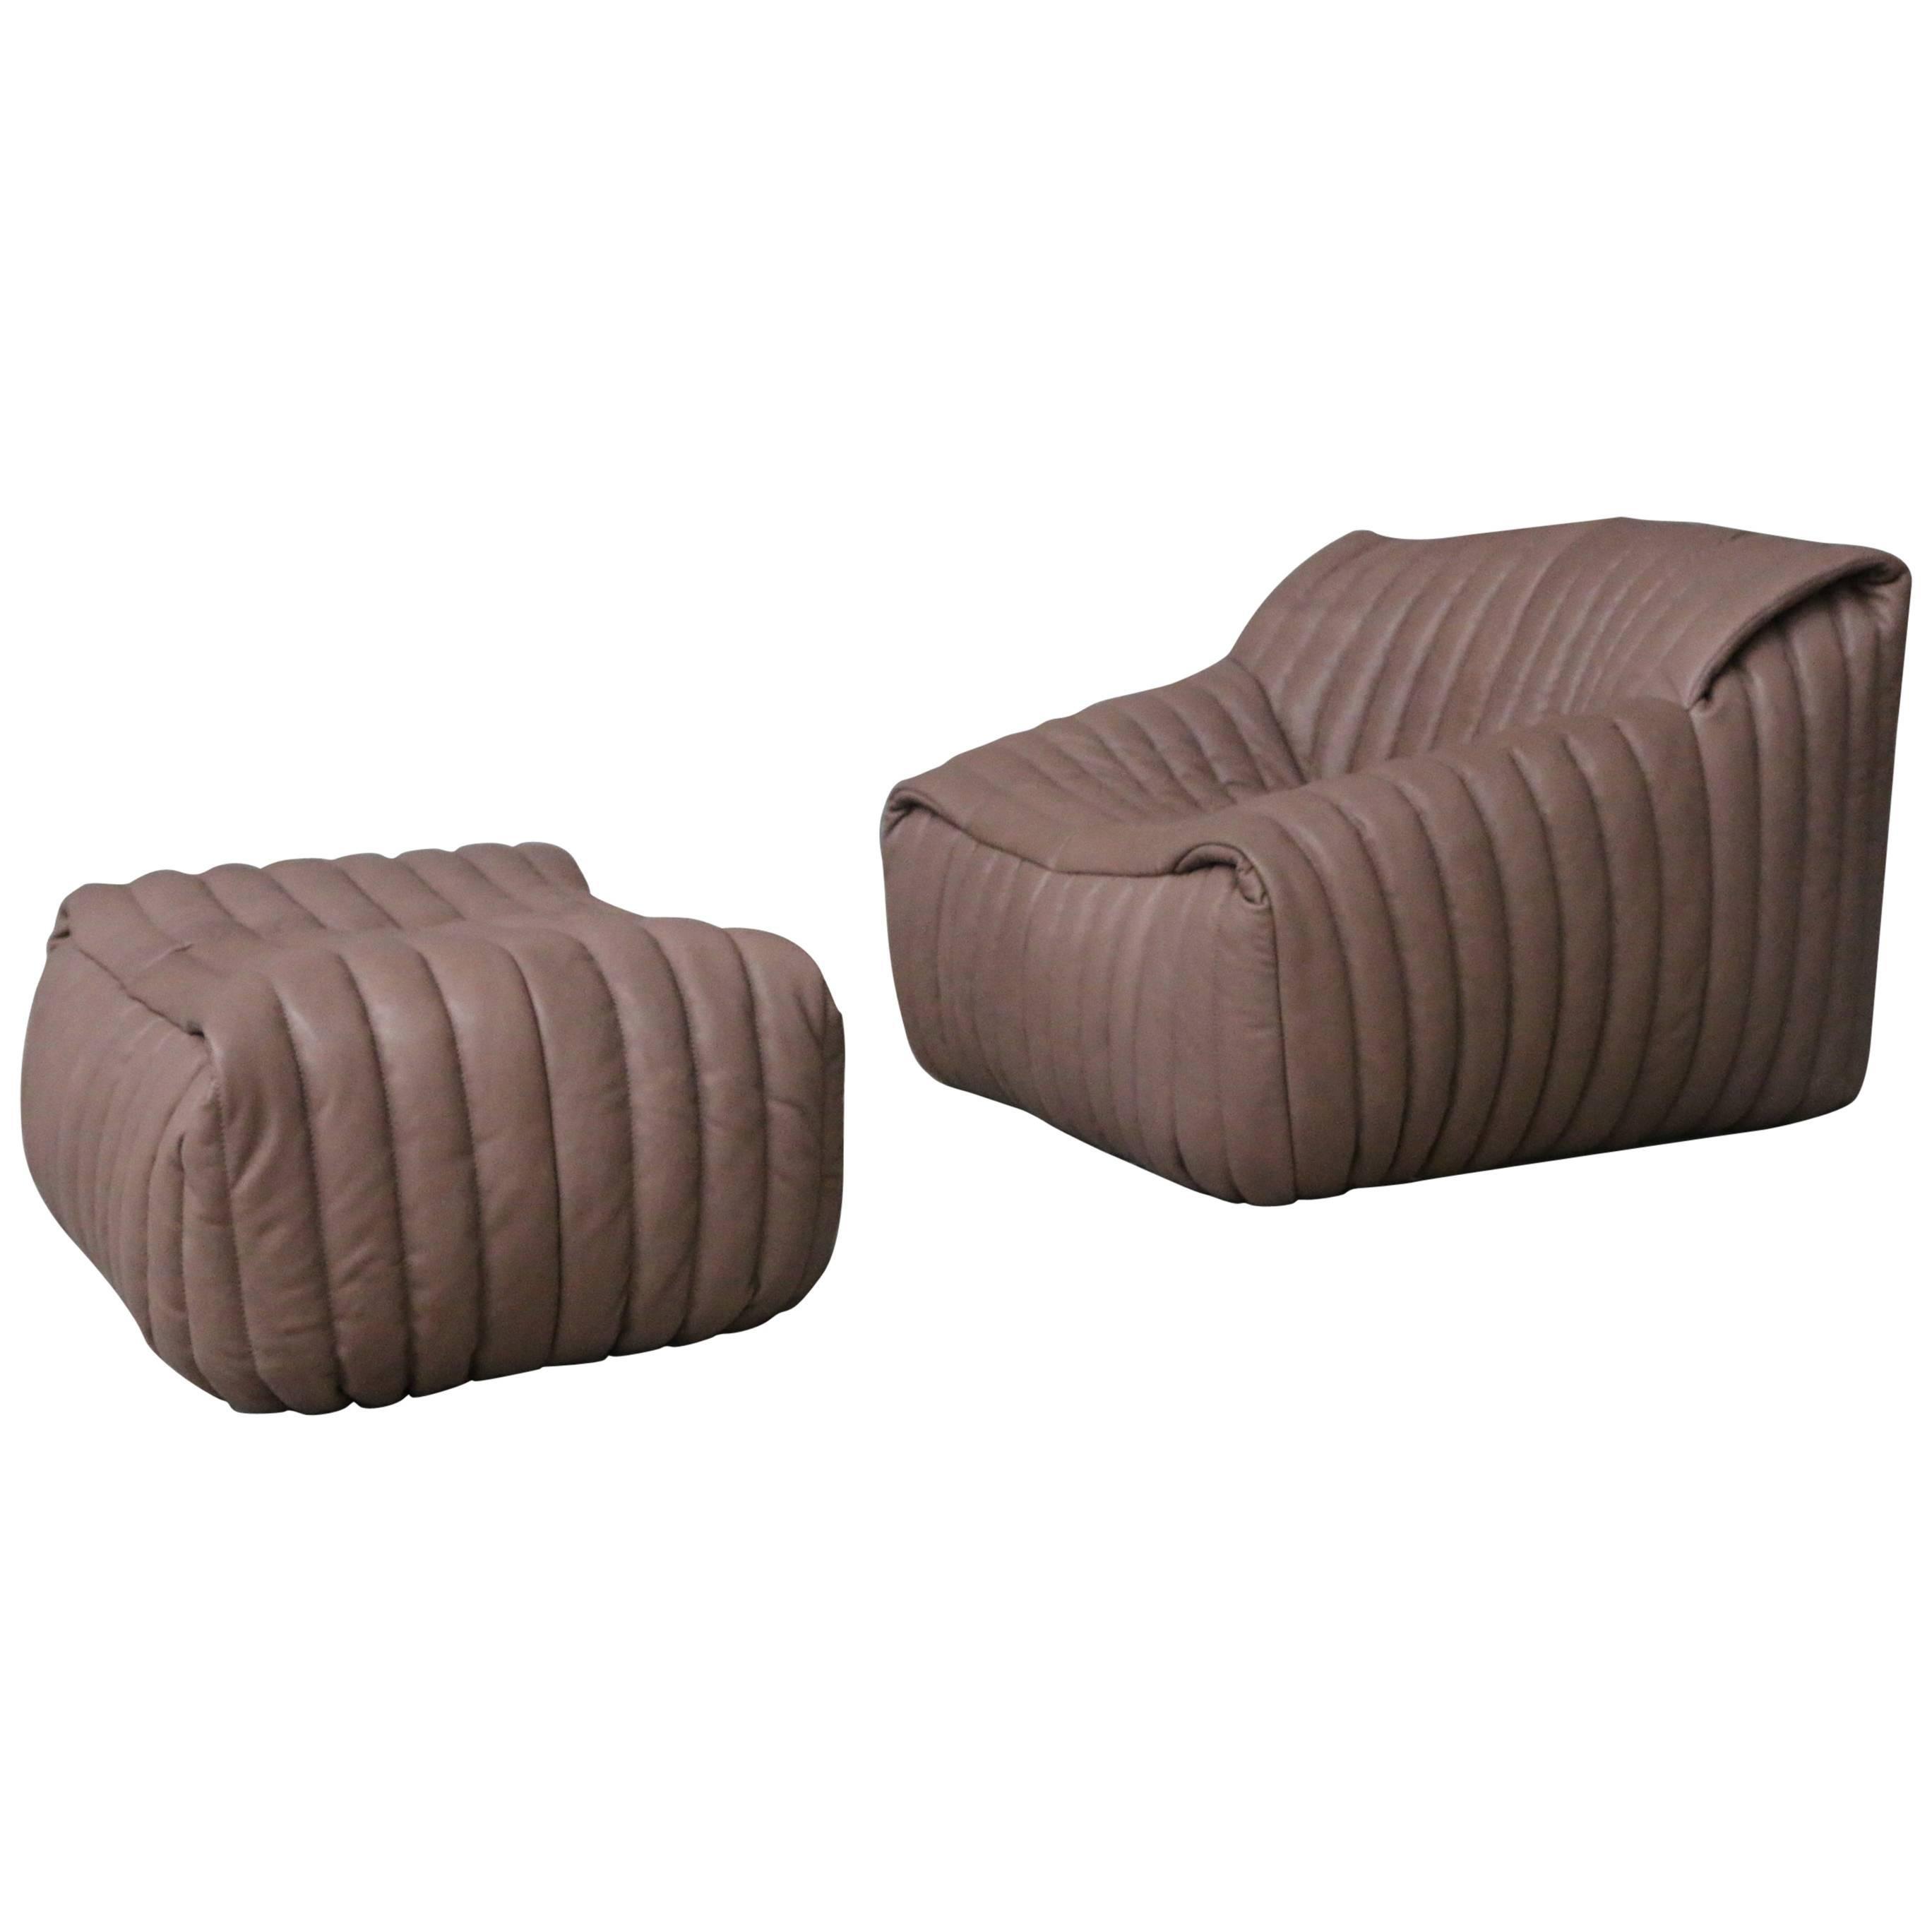 Lounge Chair And Ottoman Model Sandra By Cinna U0027Ligne Rosetu0027 ...